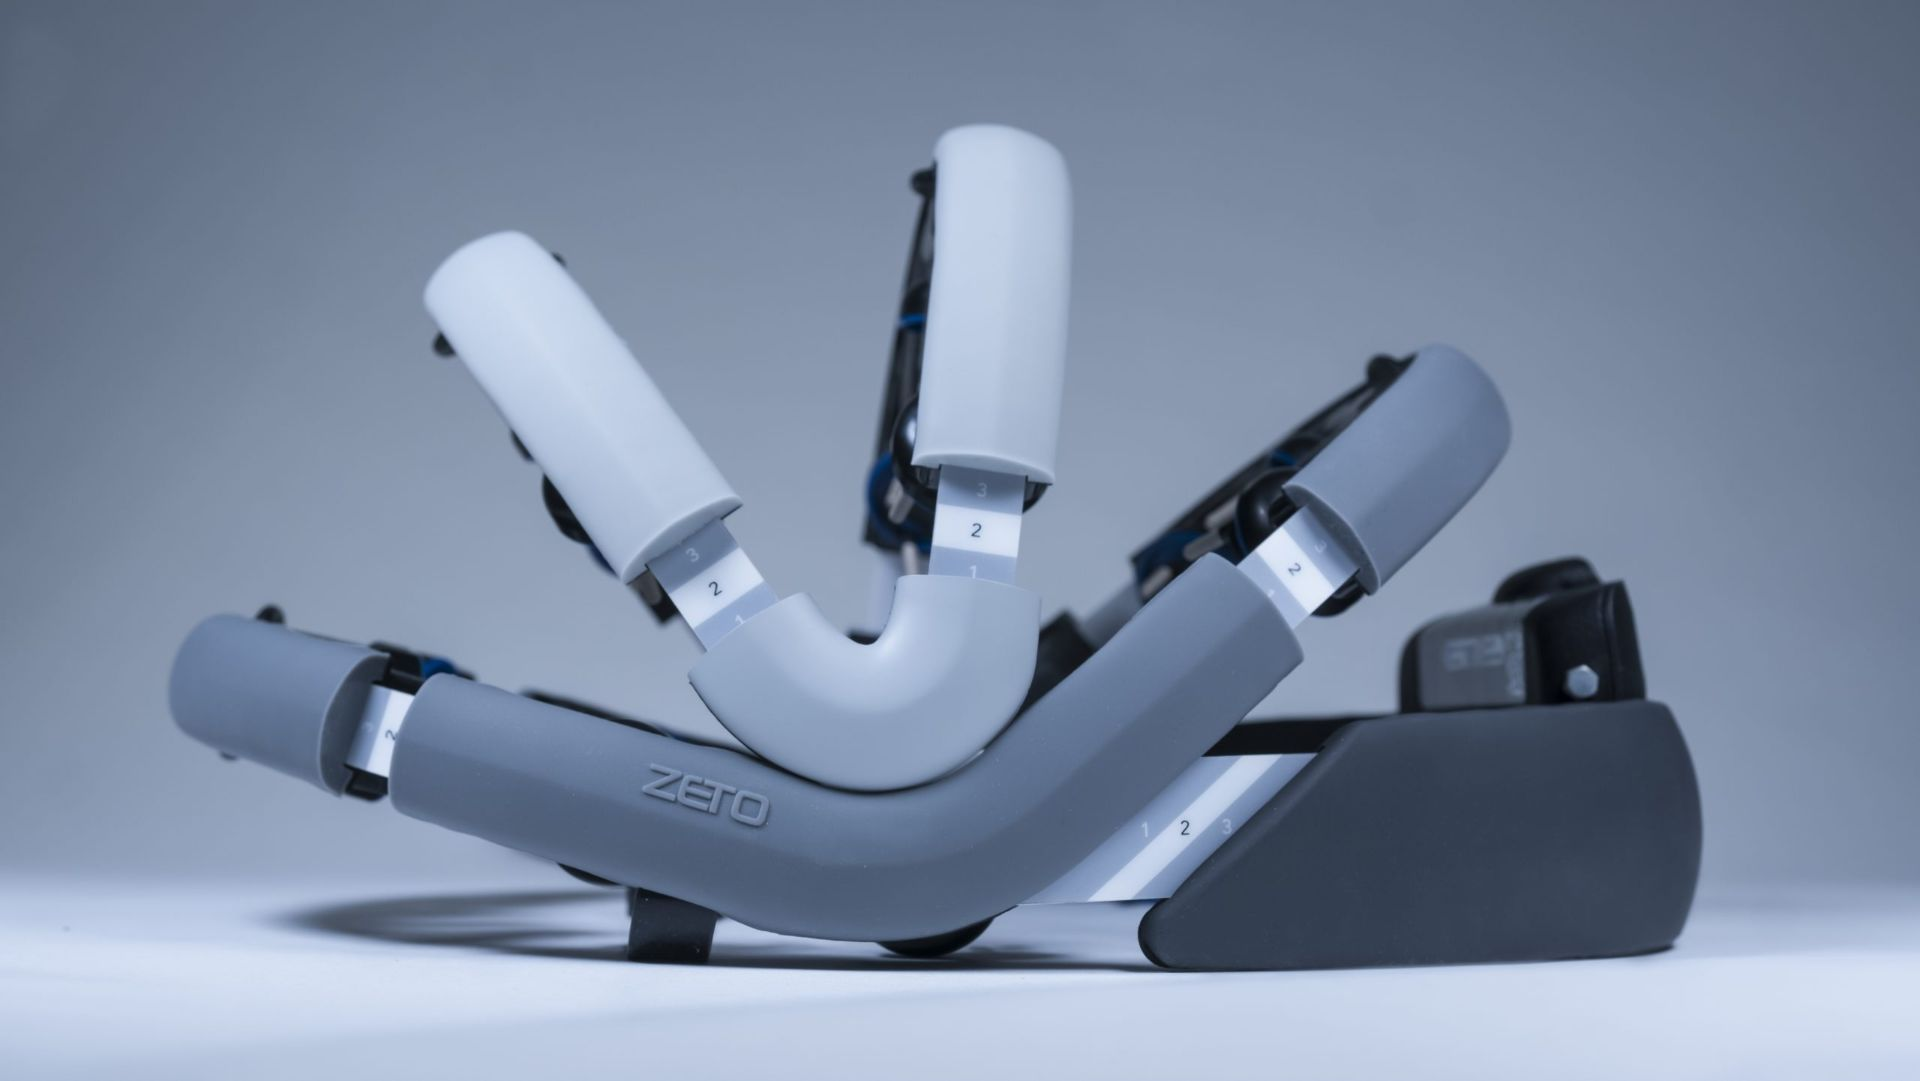 Zeto Wireless EEG Device